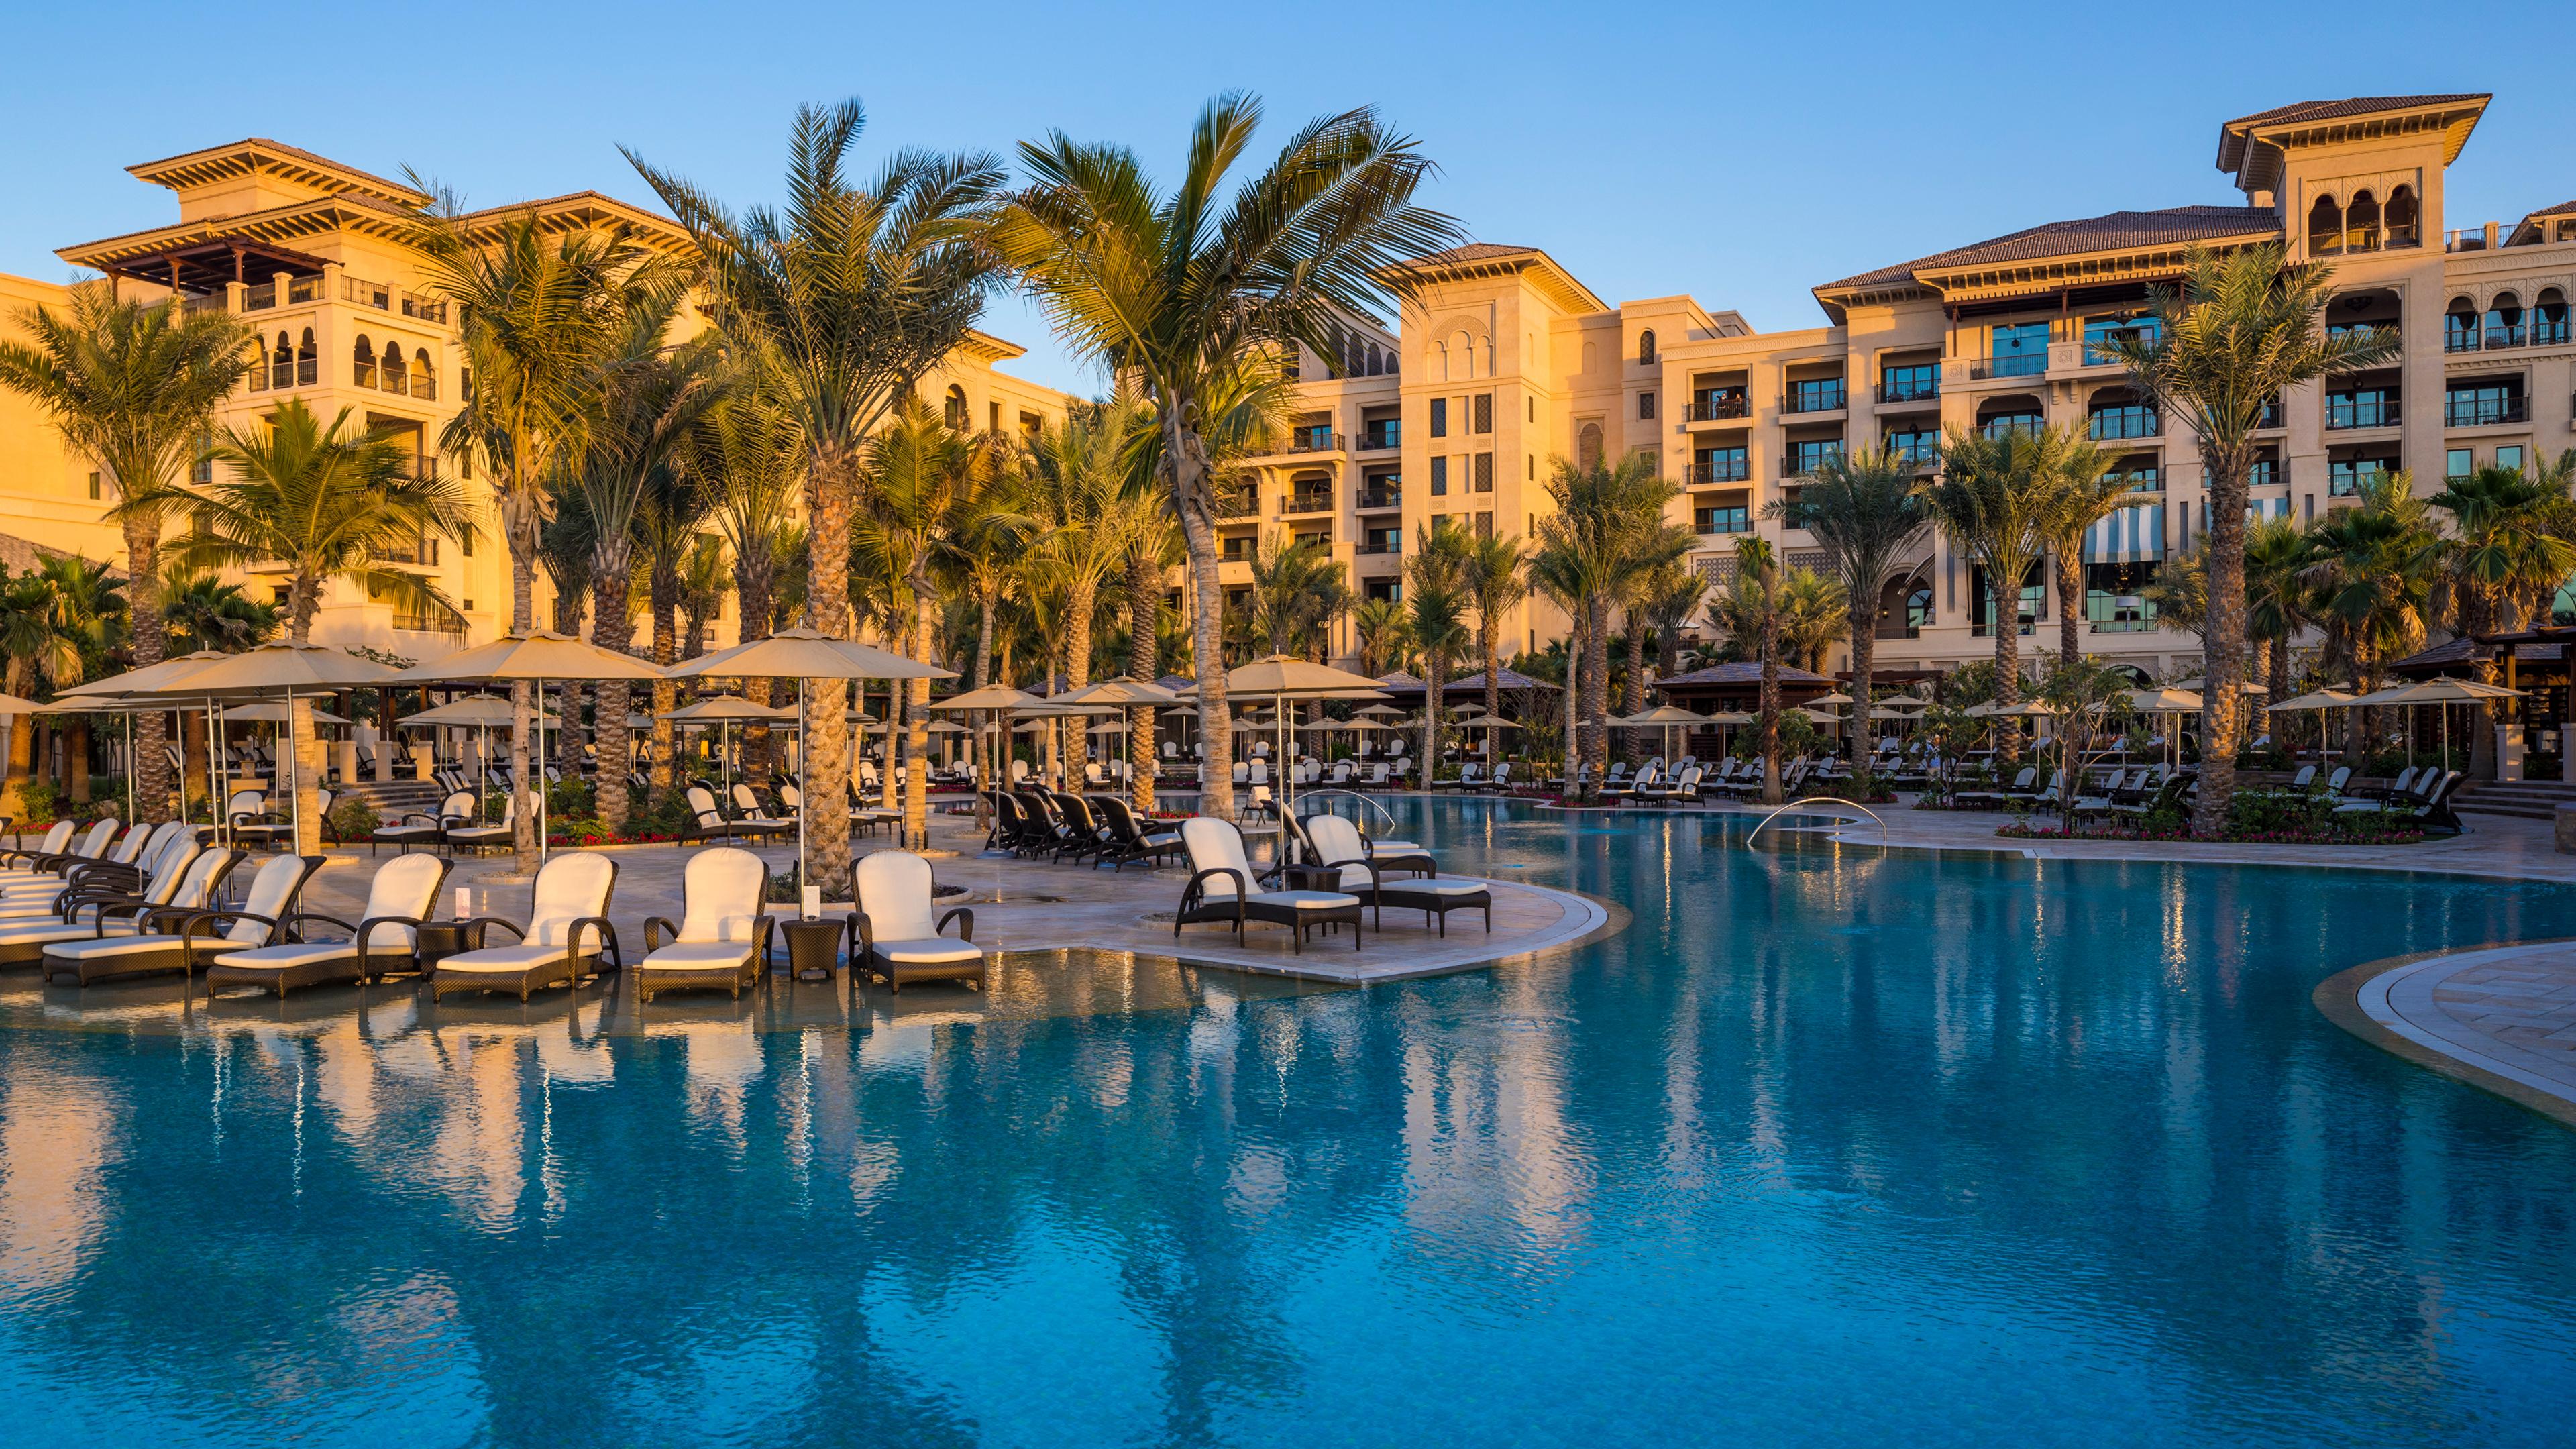 Dubai Resort Jumeirah Beach Luxury Resort